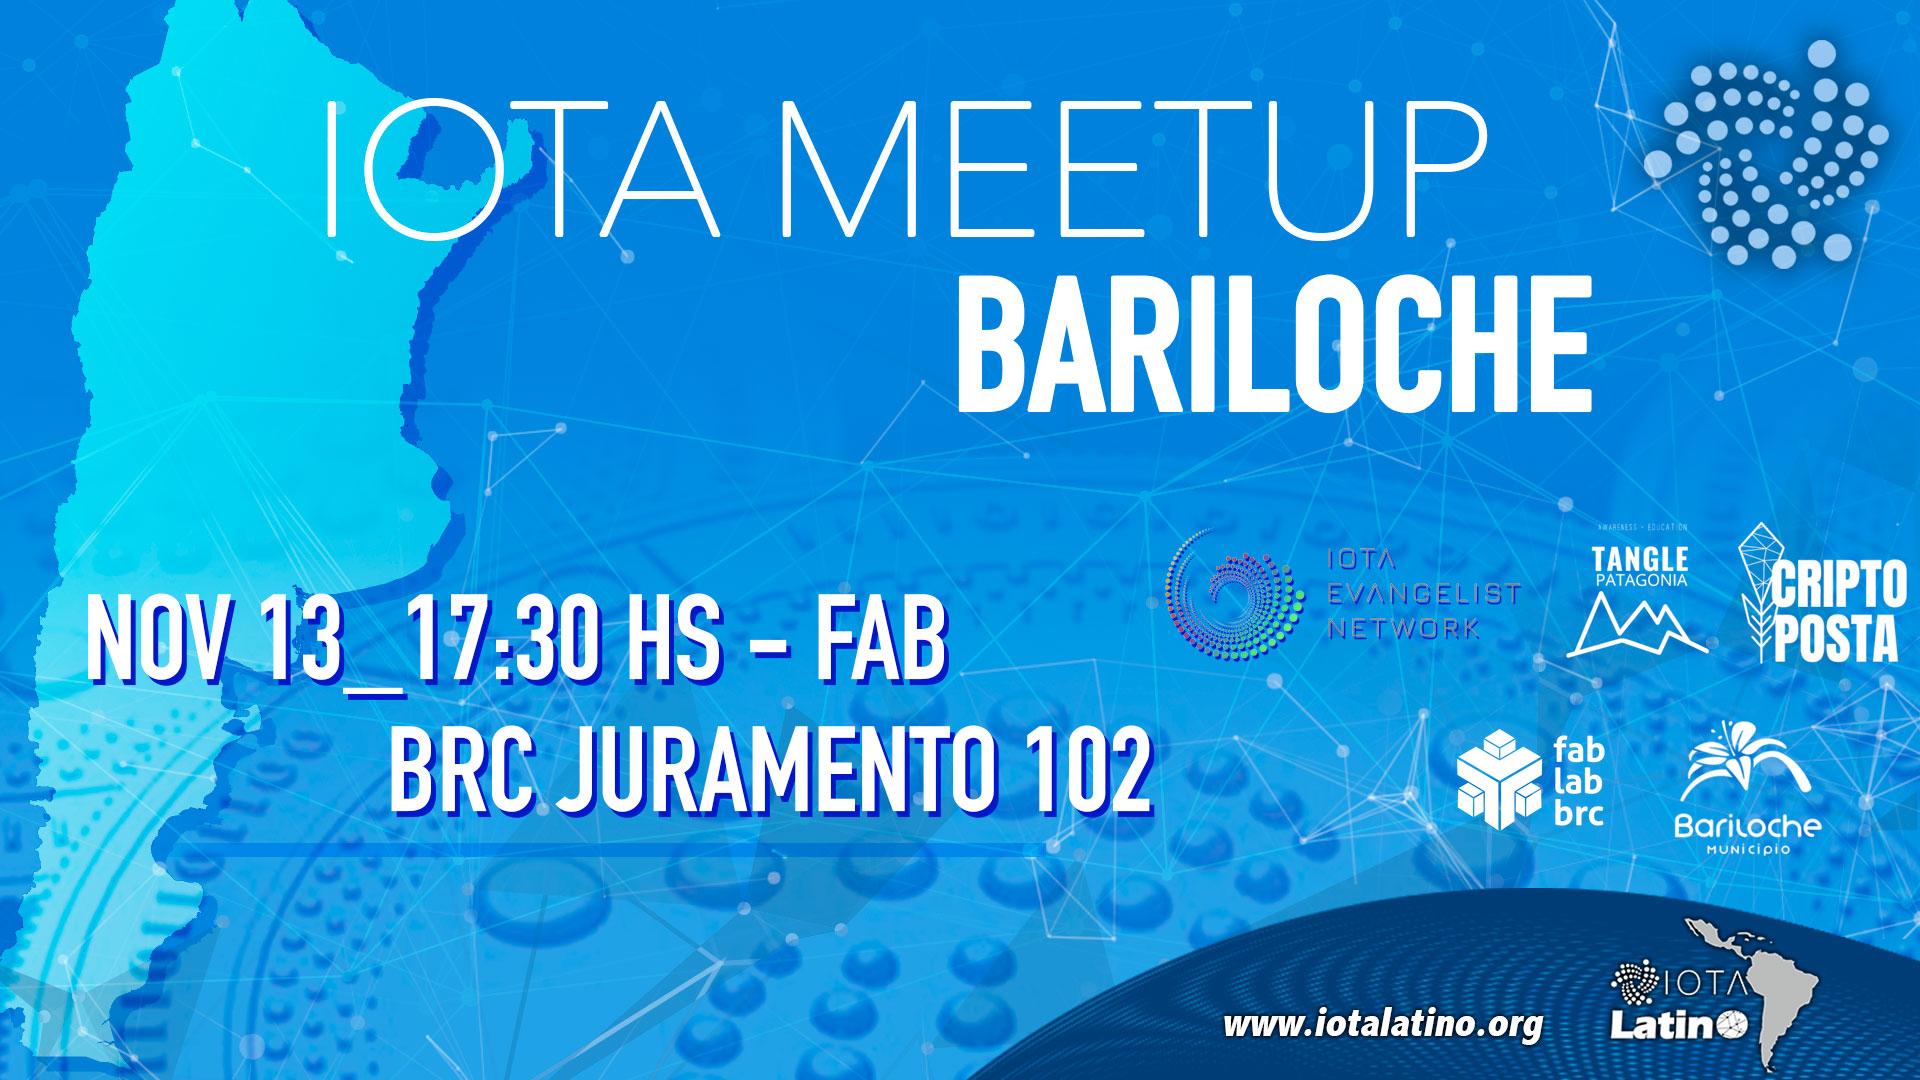 IOTA Meetup Bariloche